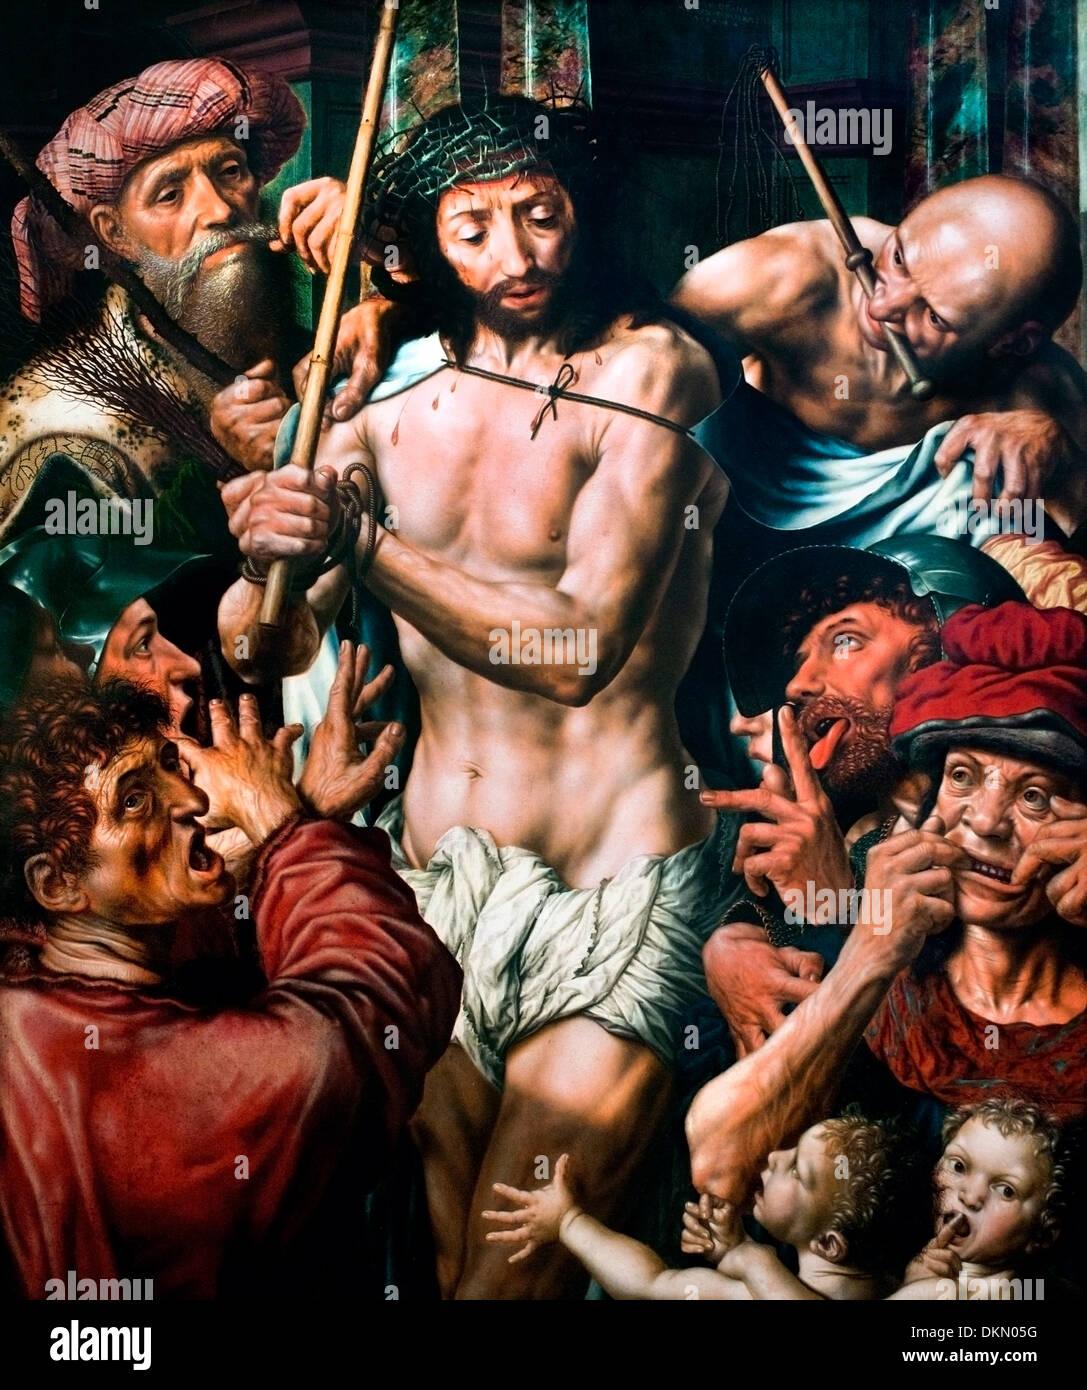 Verspottung Christi - mocking of Christ by Jan Sanders van Hemessen 1504-1575  Dutch Netherlands - Stock Image